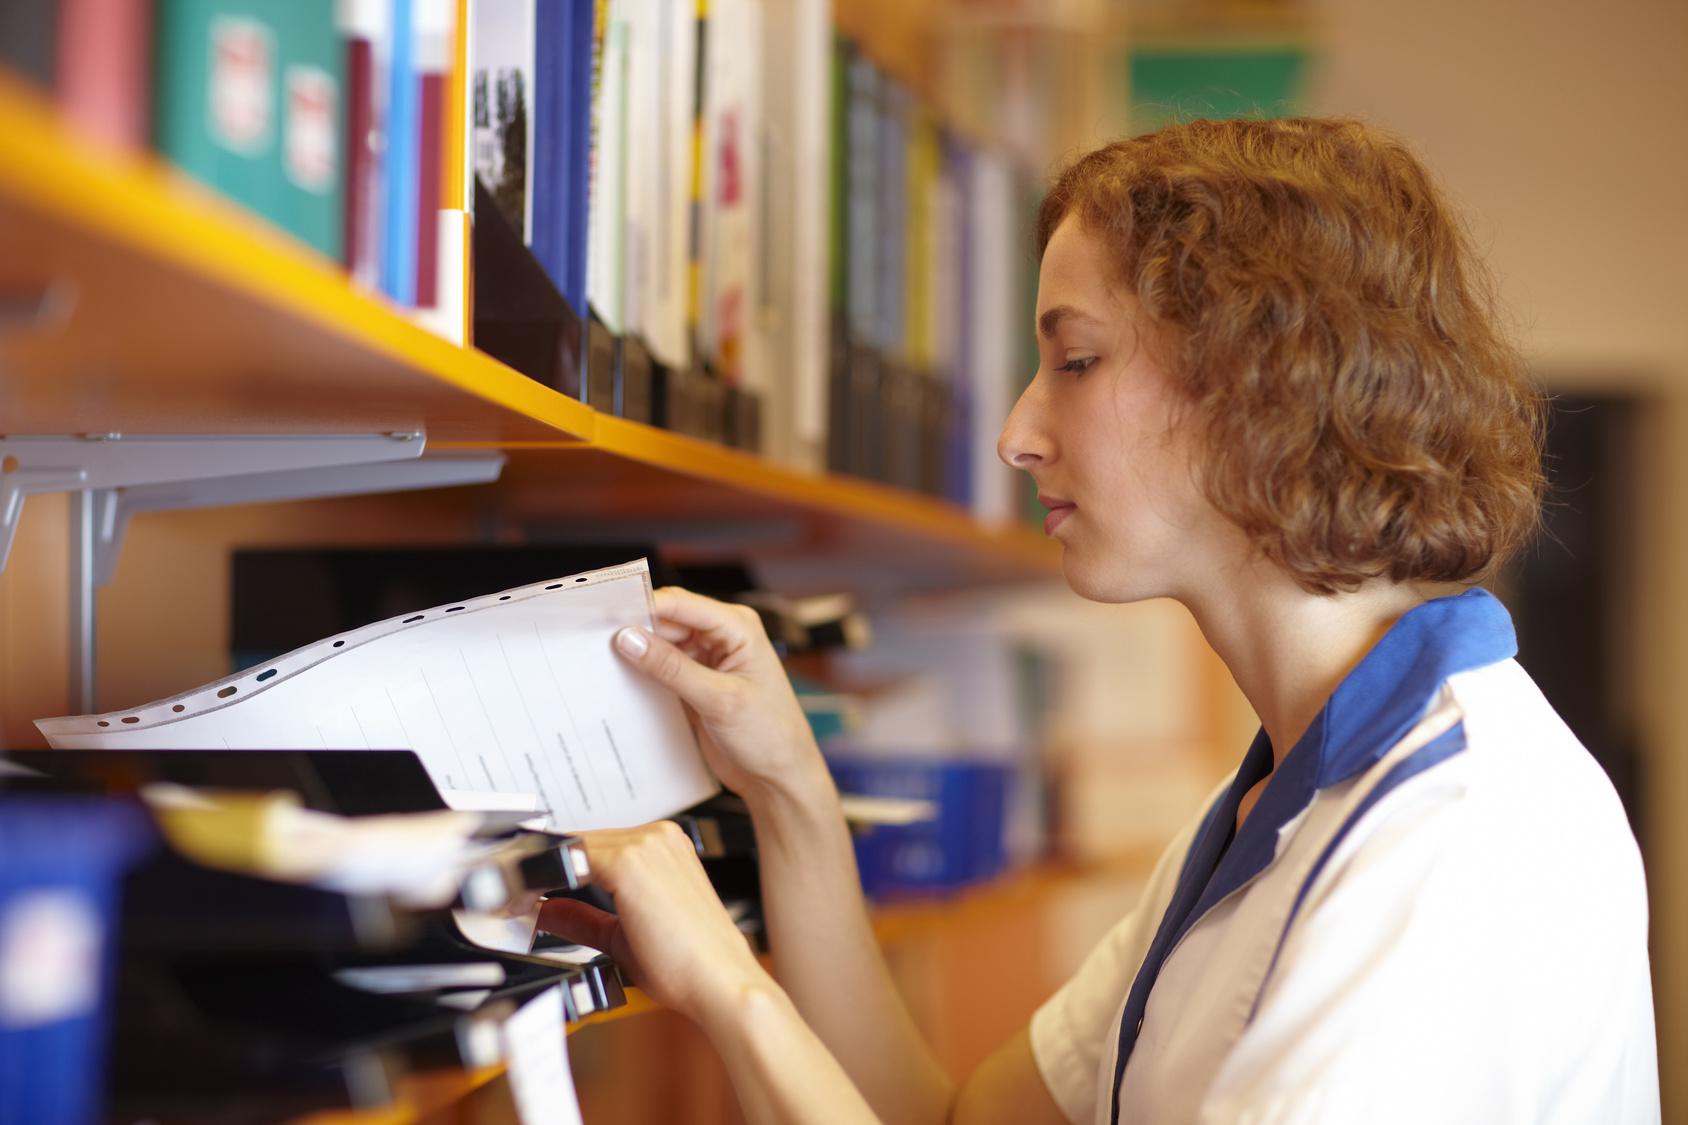 Fotolia_18989010_woman looking at files_M